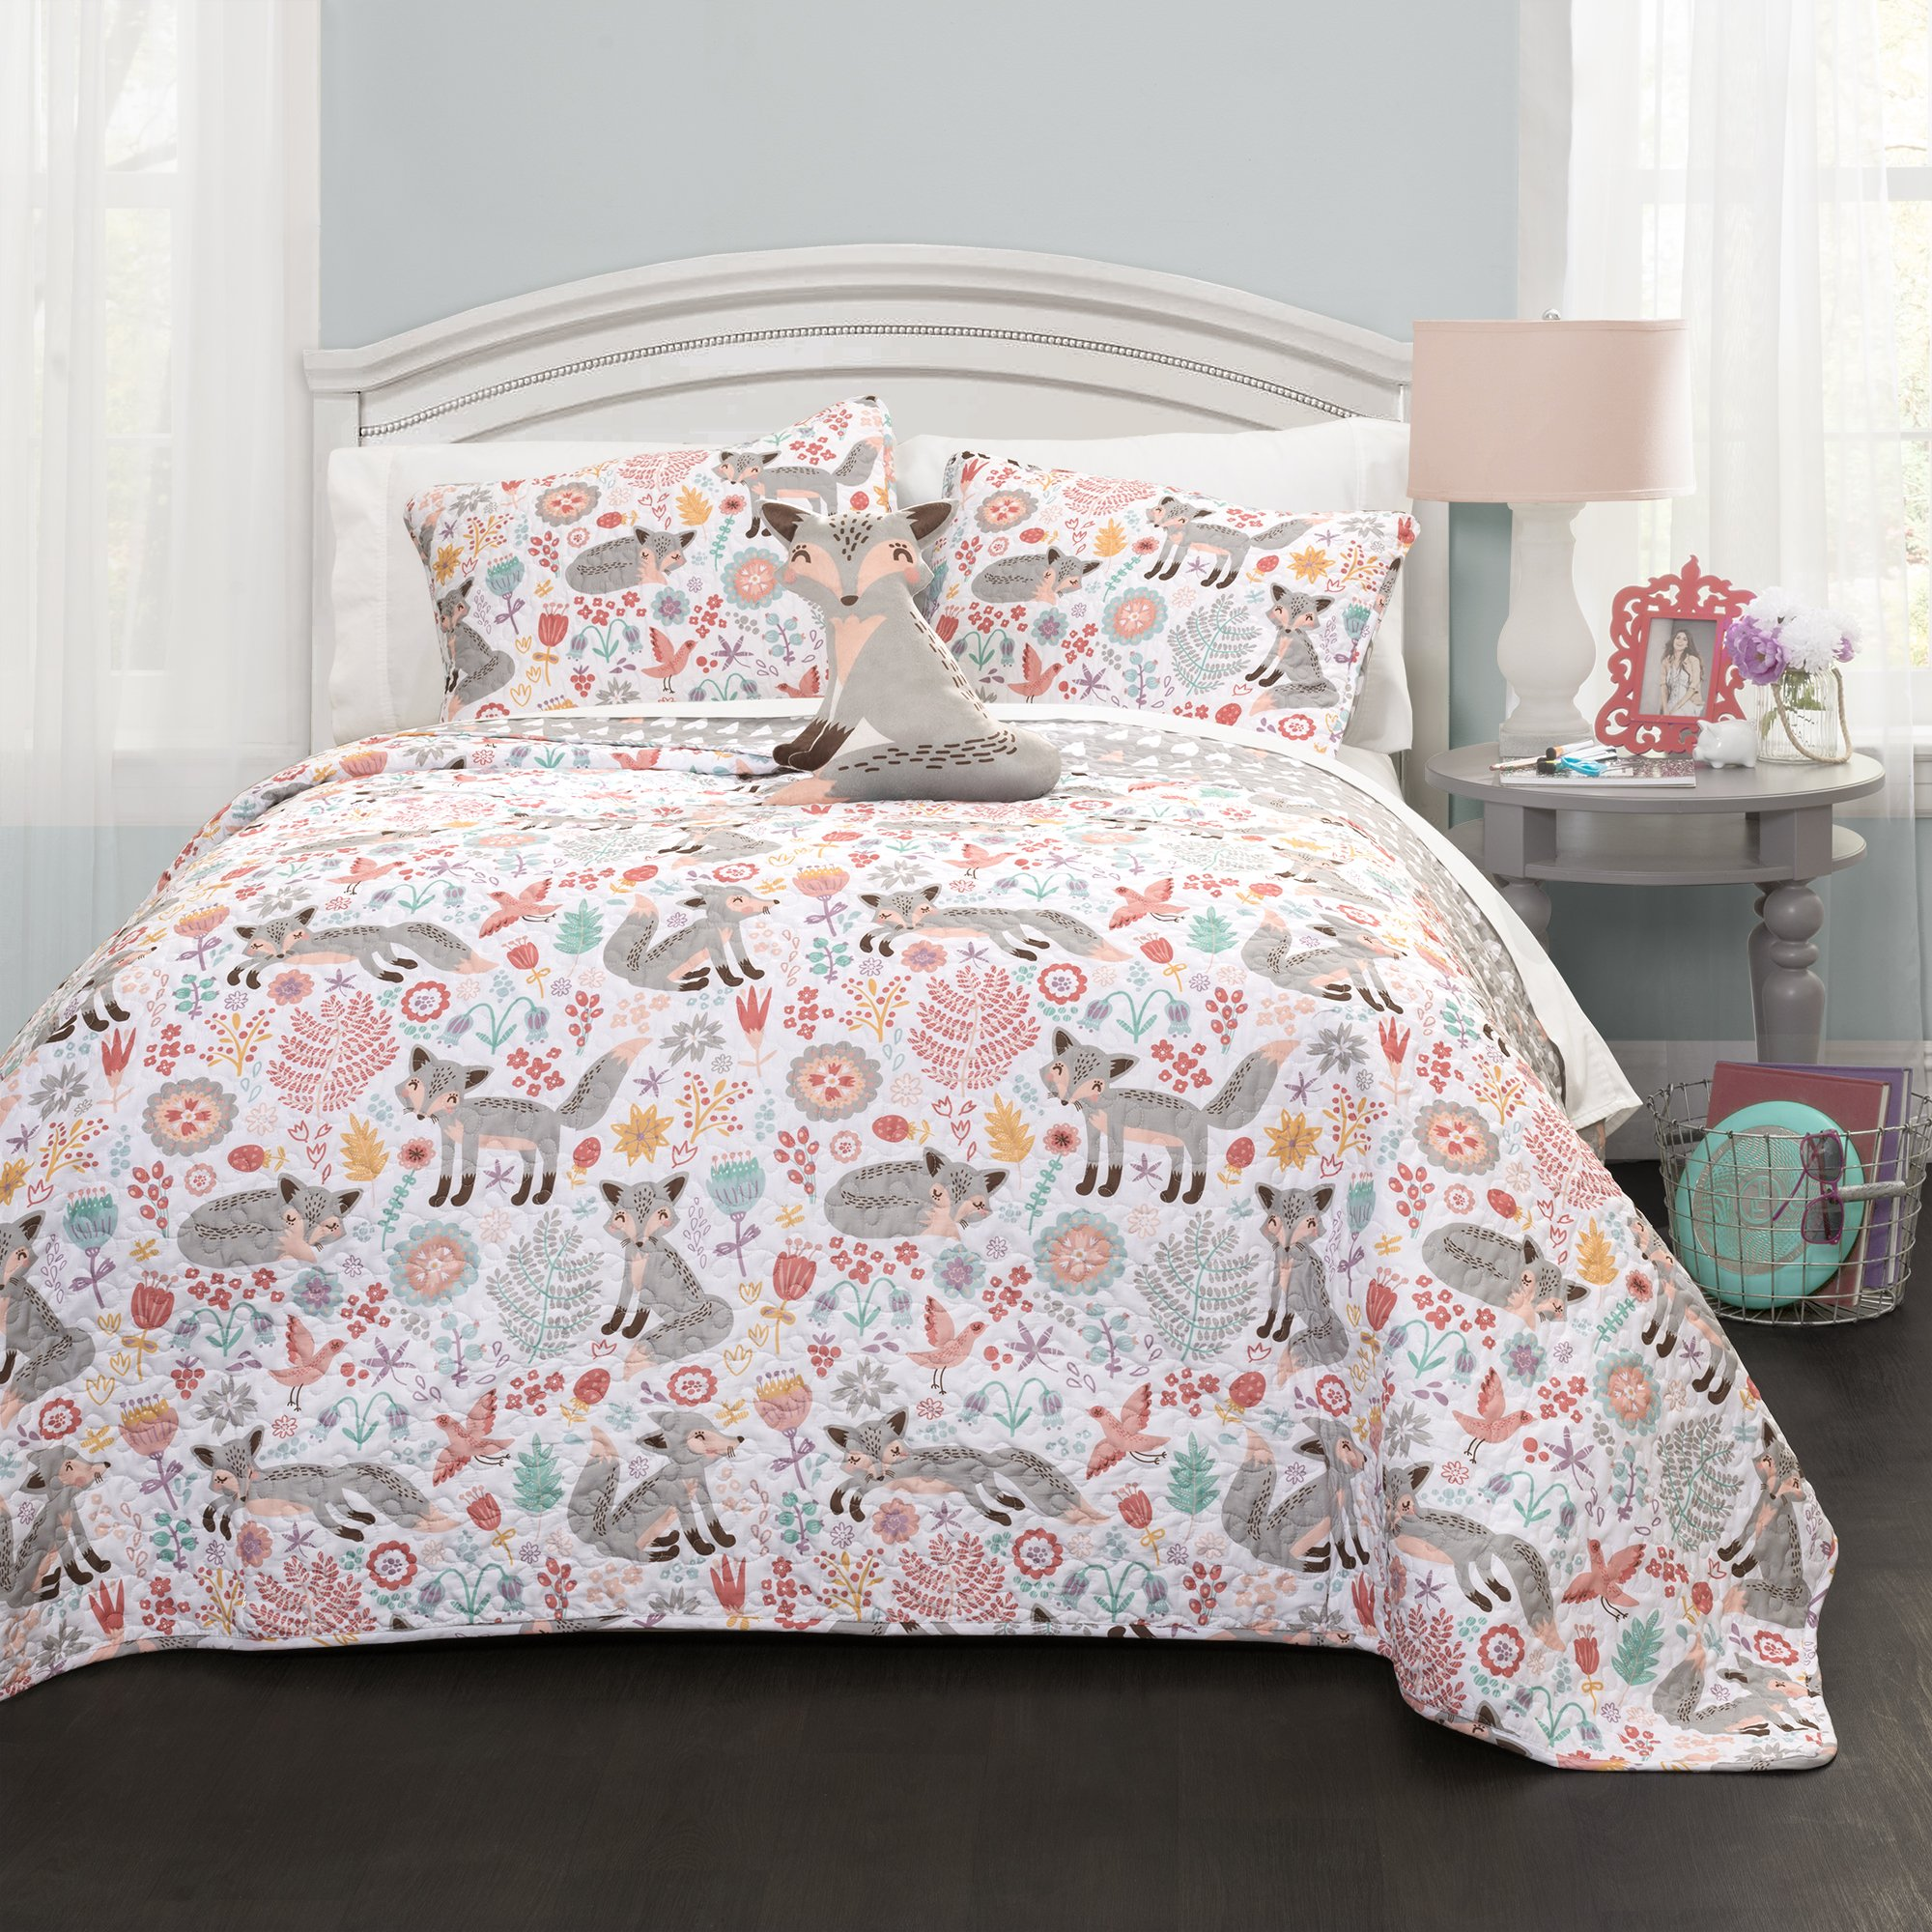 Lush Decor Pixie Fox Quilt Reversible 3 Piece Bedding Set - Gray/Pink - Twin Quilt Set by Lush Decor